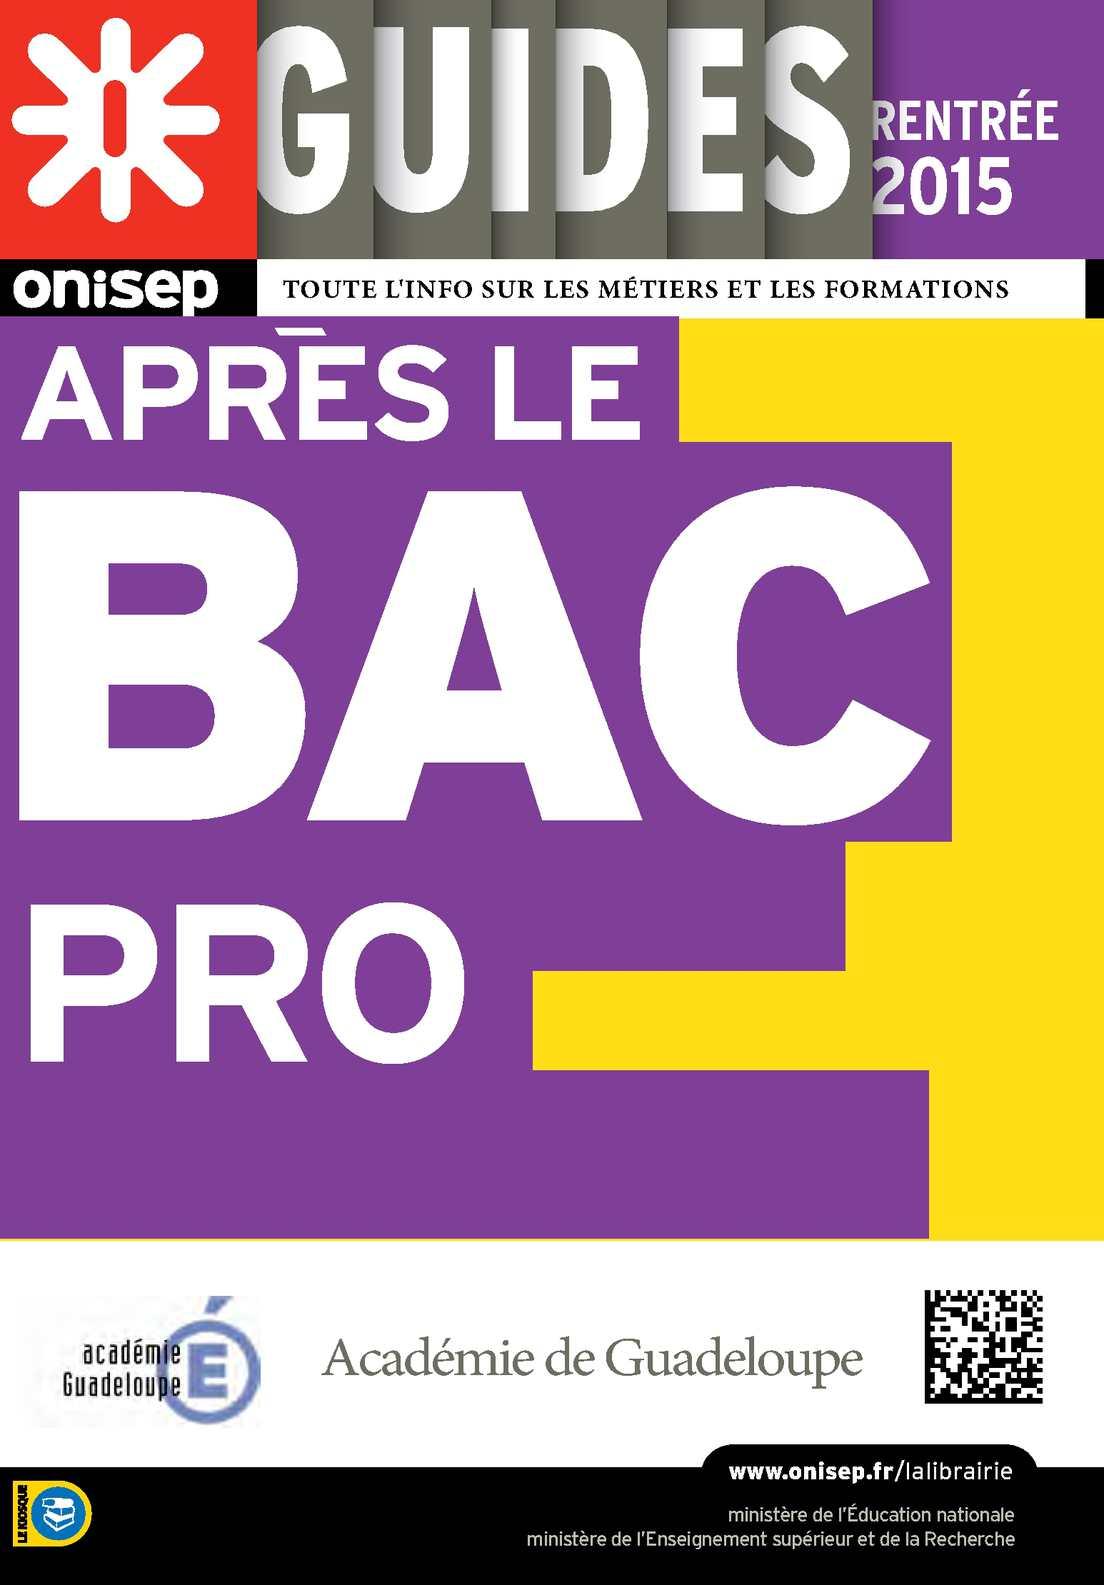 Calam o apr s le bac pro rentr e 2015 guadeloupe - Office education nationale ...